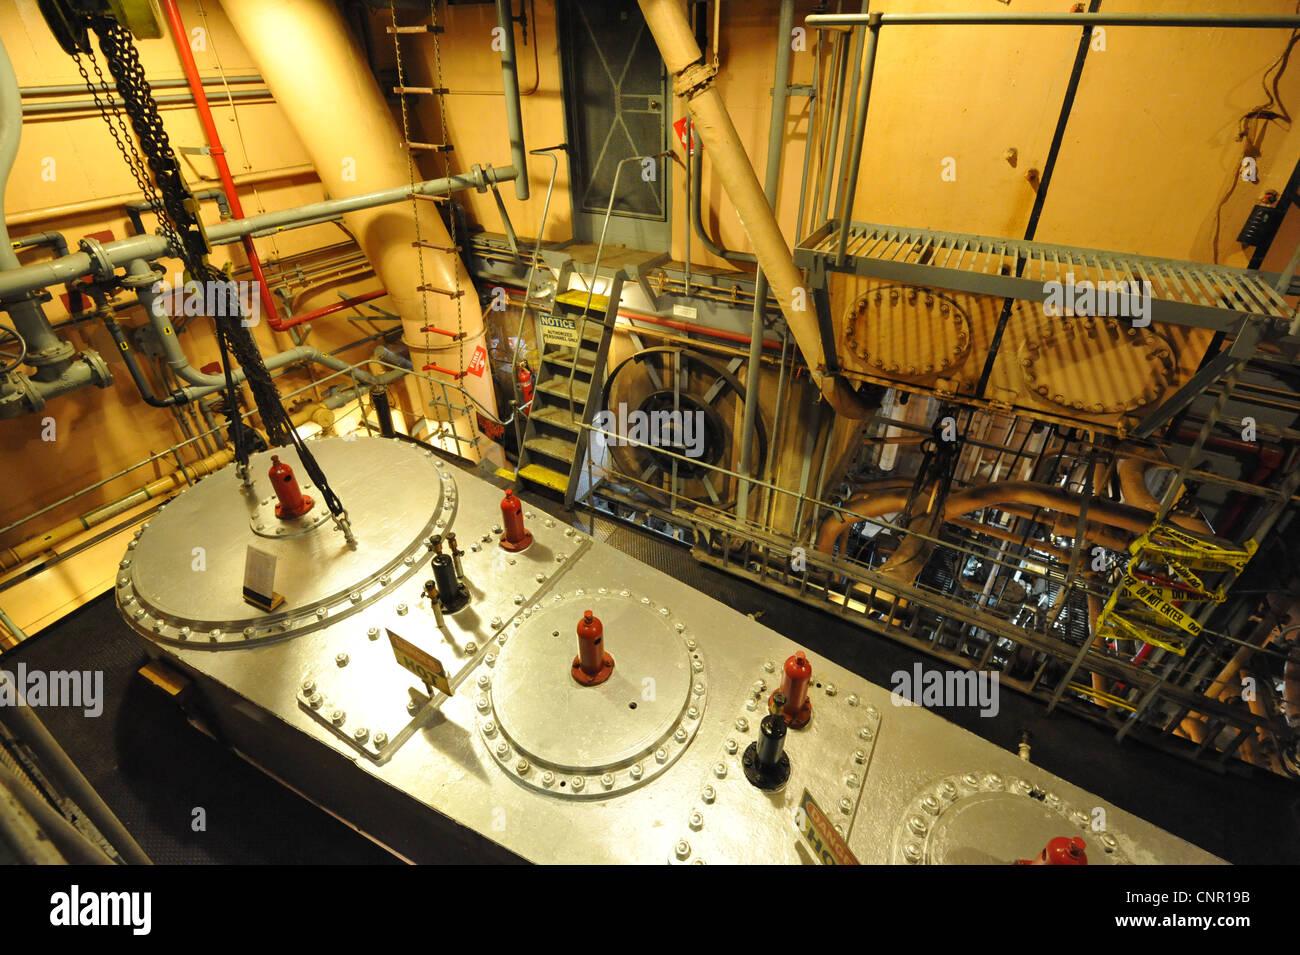 Ss Jeremiah O 39 Brien A Liberty Ship Engine Room Stock Photo Royalty Free Image 47834455 Alamy